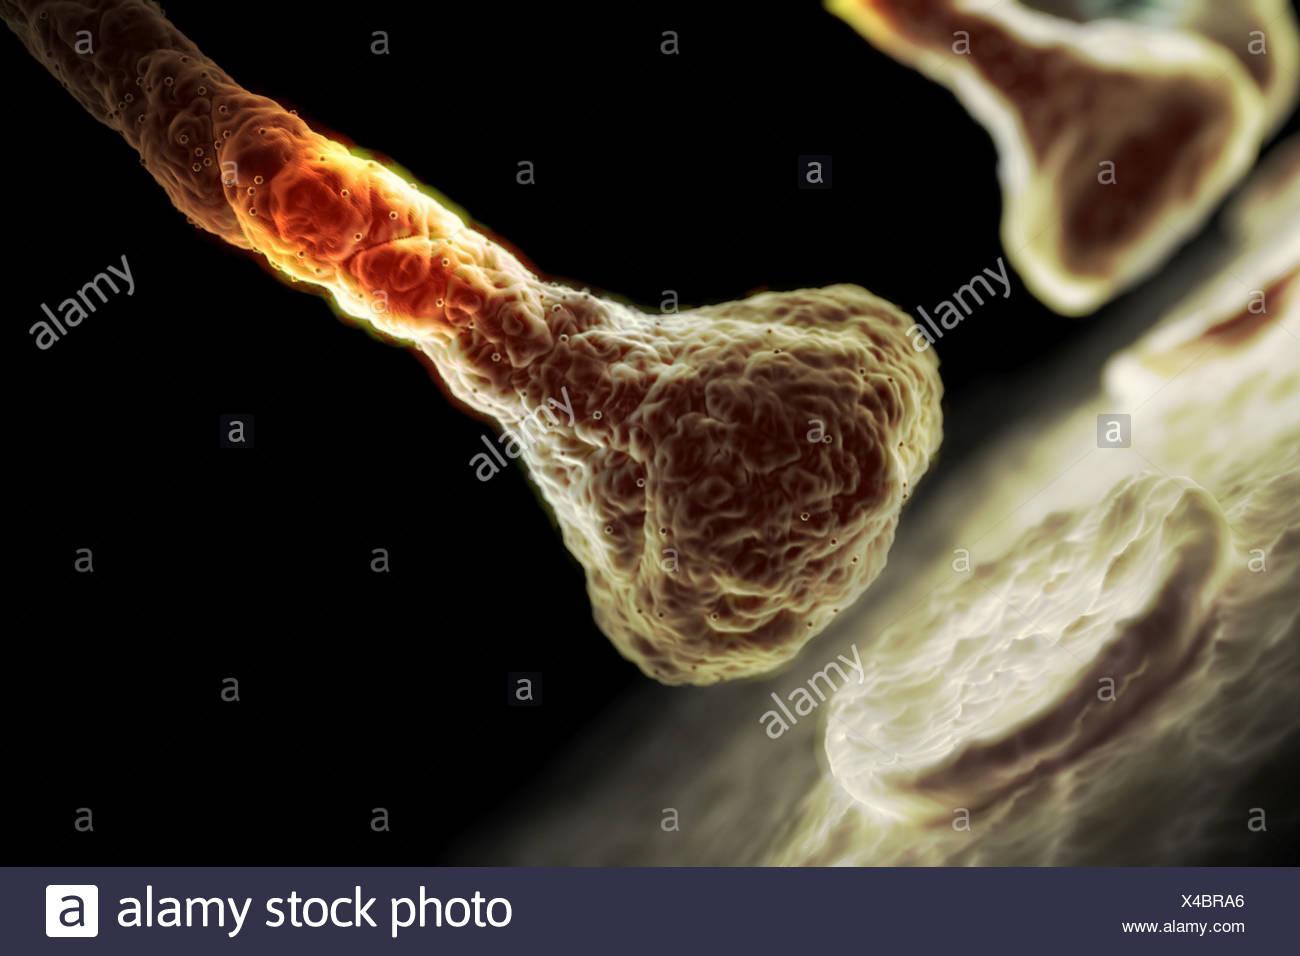 Style microscopiques visualisation d'un synapse. Photo Stock